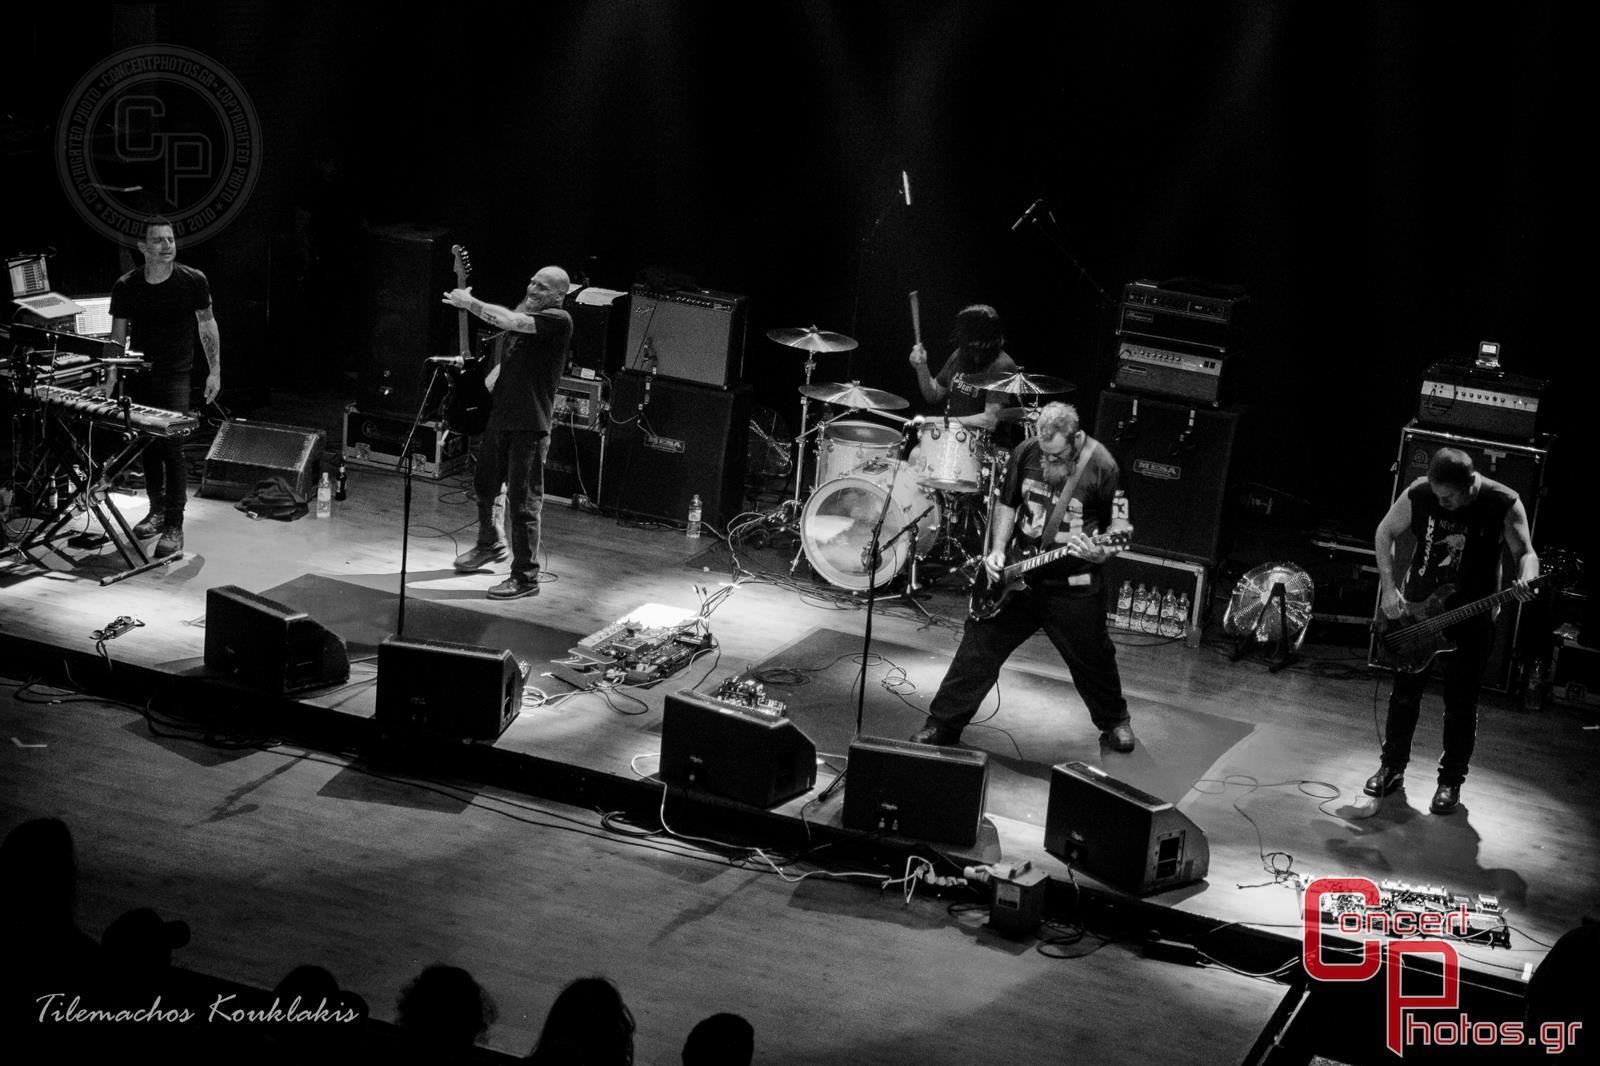 Neurosis-Neurosis photographer:  - concertphotos_20140707_23_56_37-4